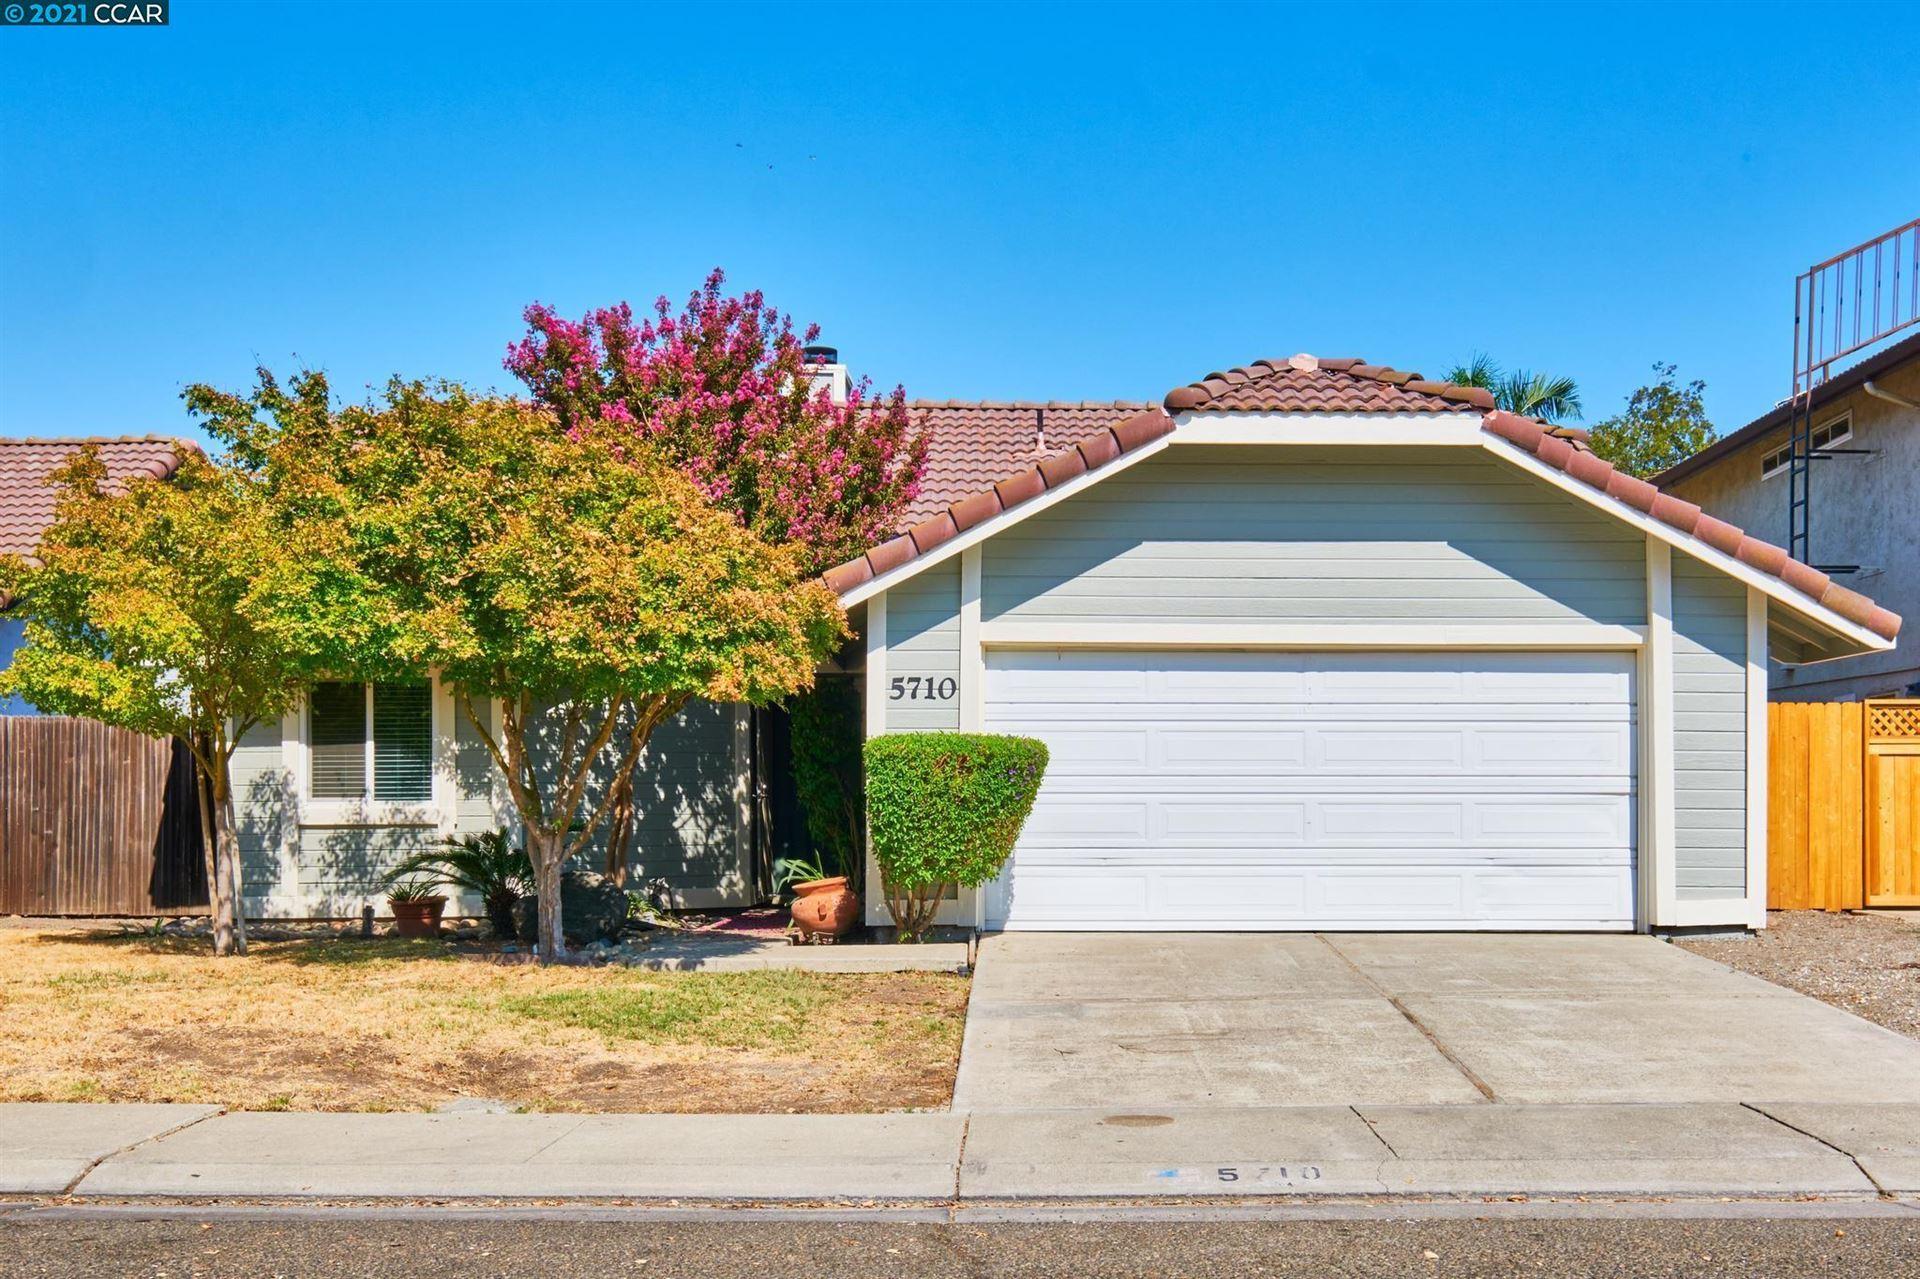 5710 Atchenson Ct, Stockton, CA 95210 - MLS#: 40967444